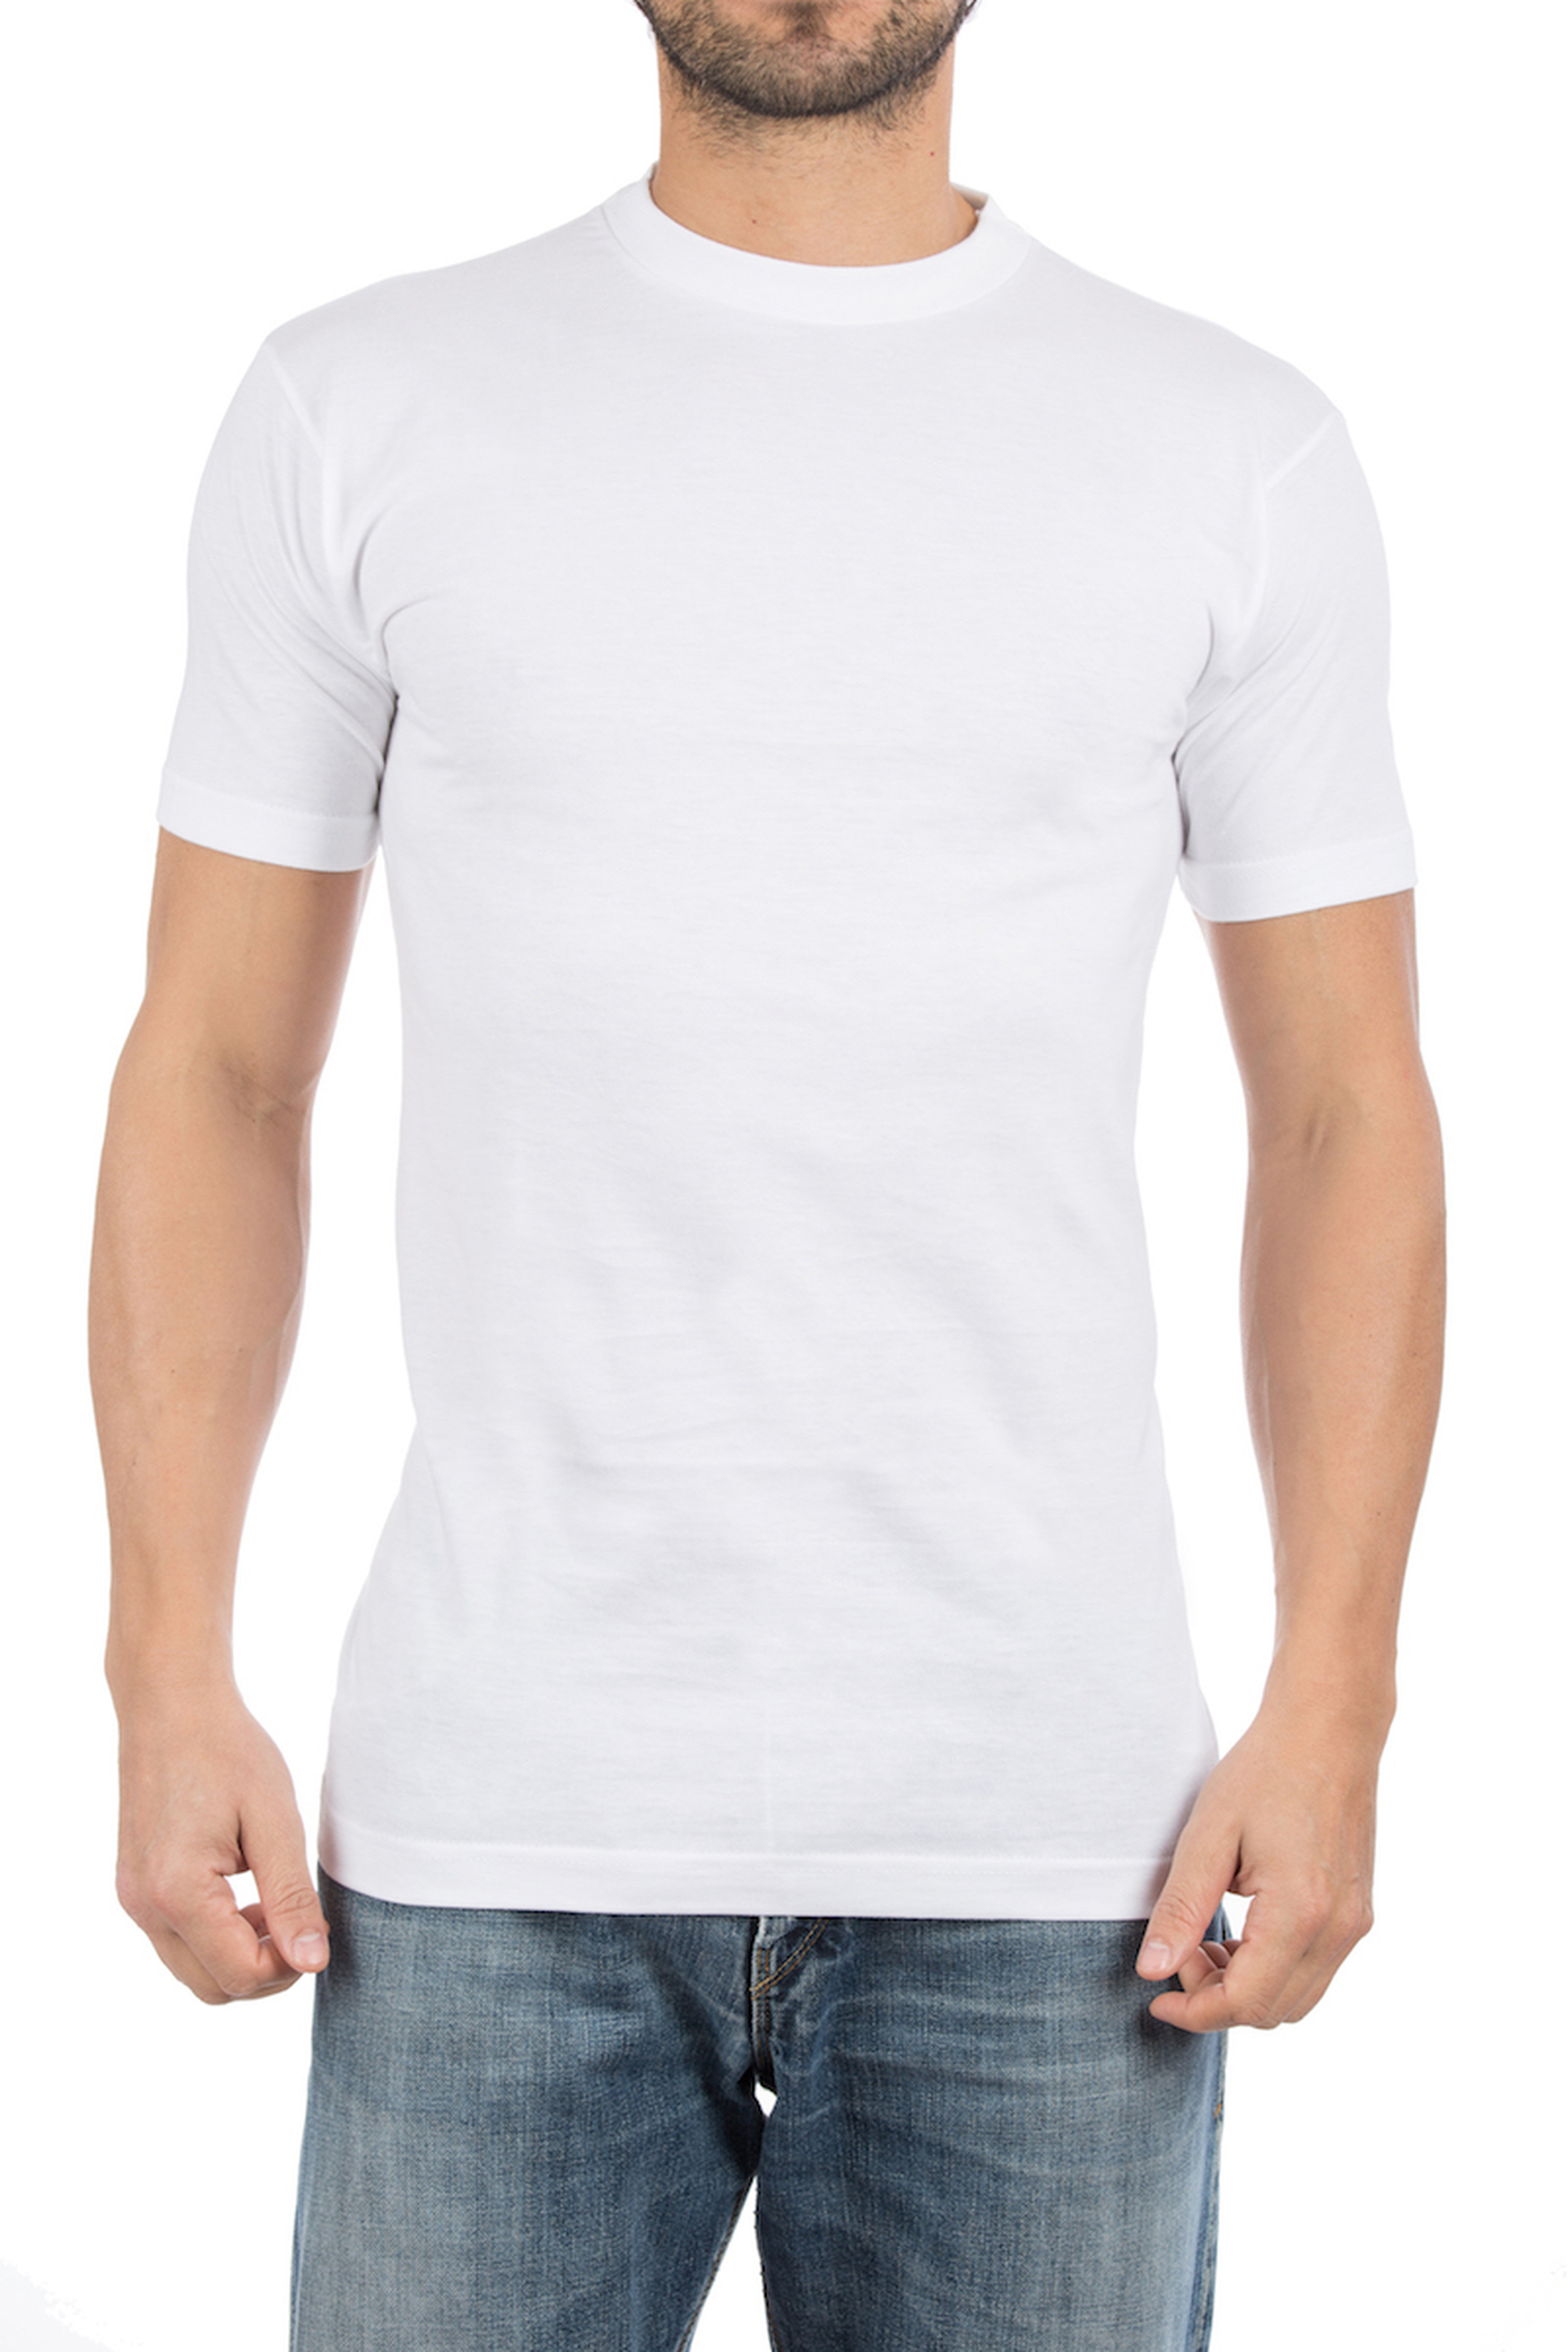 Alan Red T-Shirt Virginia Navy (2 pack)